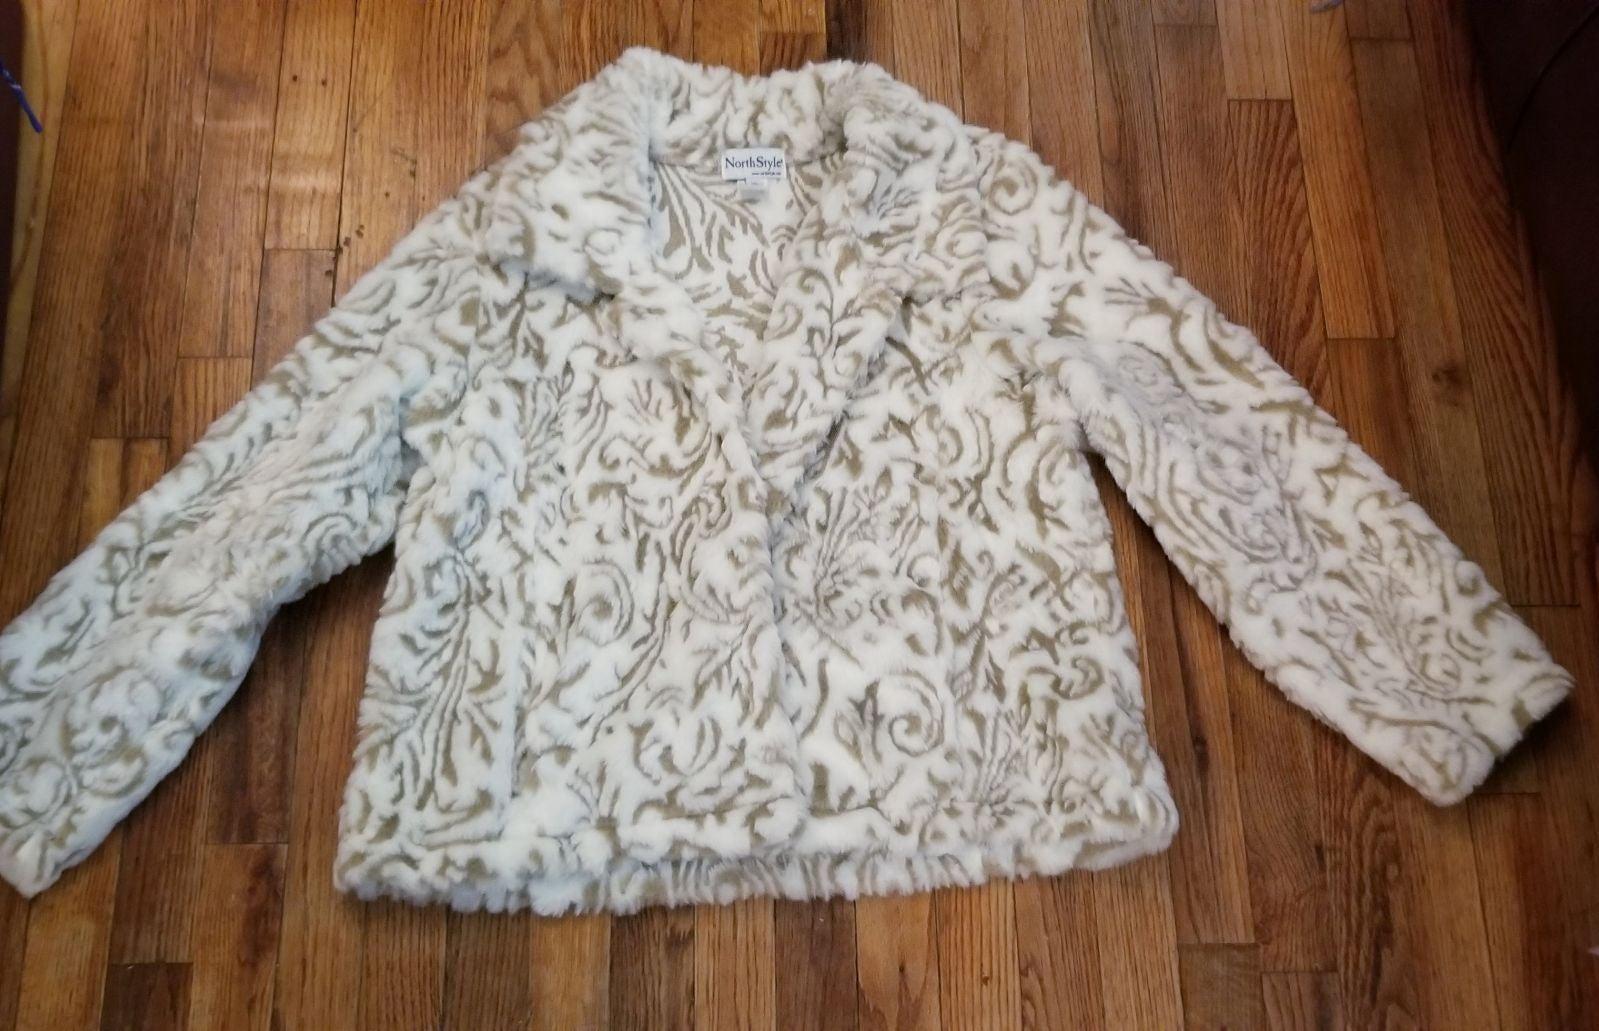 NORTH STYLE Faux Fur Jacket XL